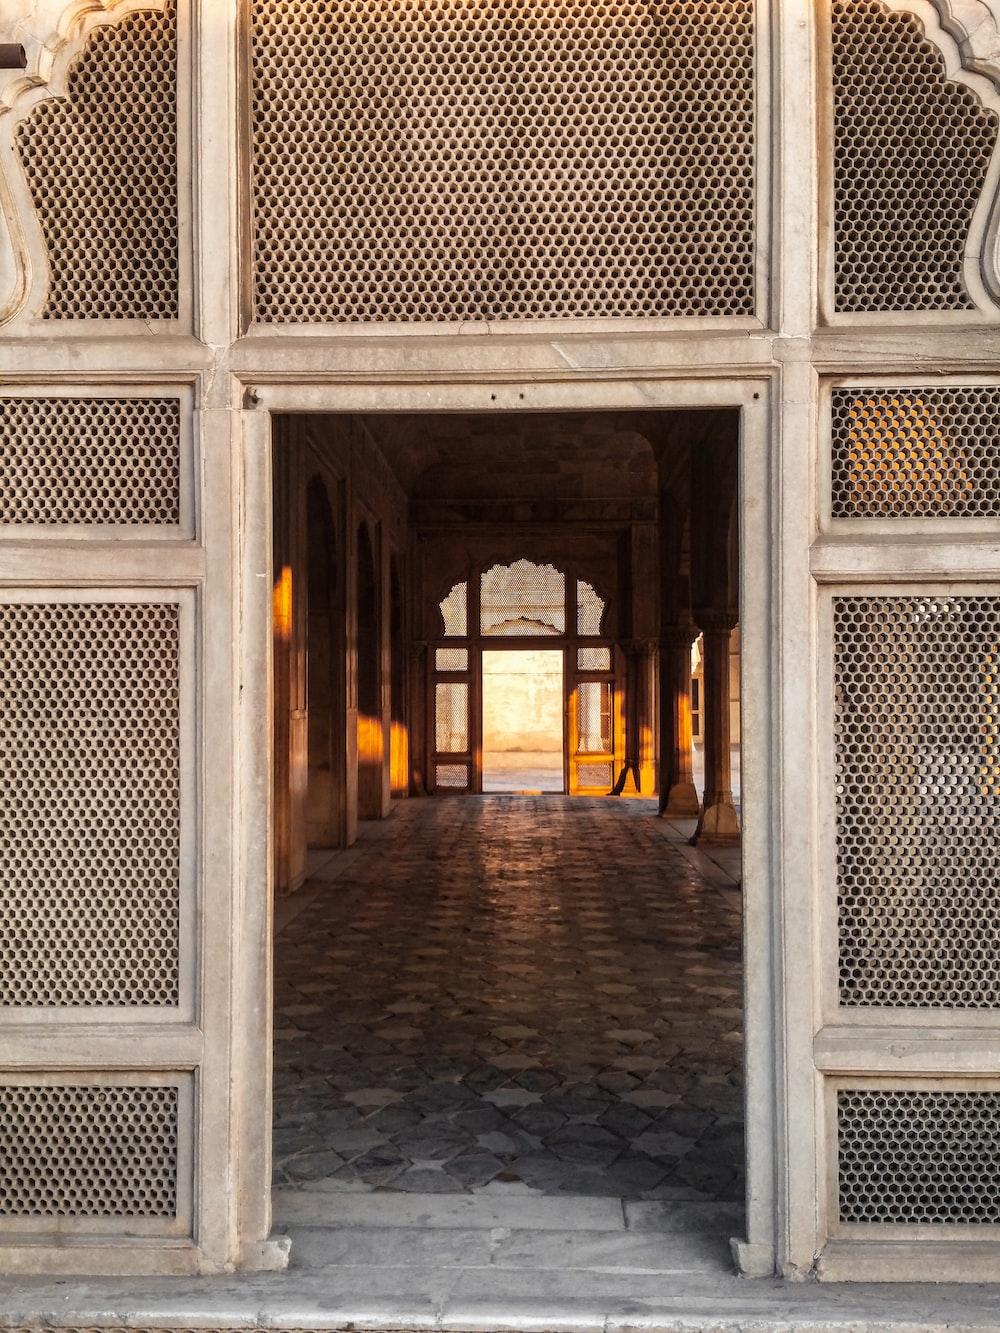 brown brick building with arch door